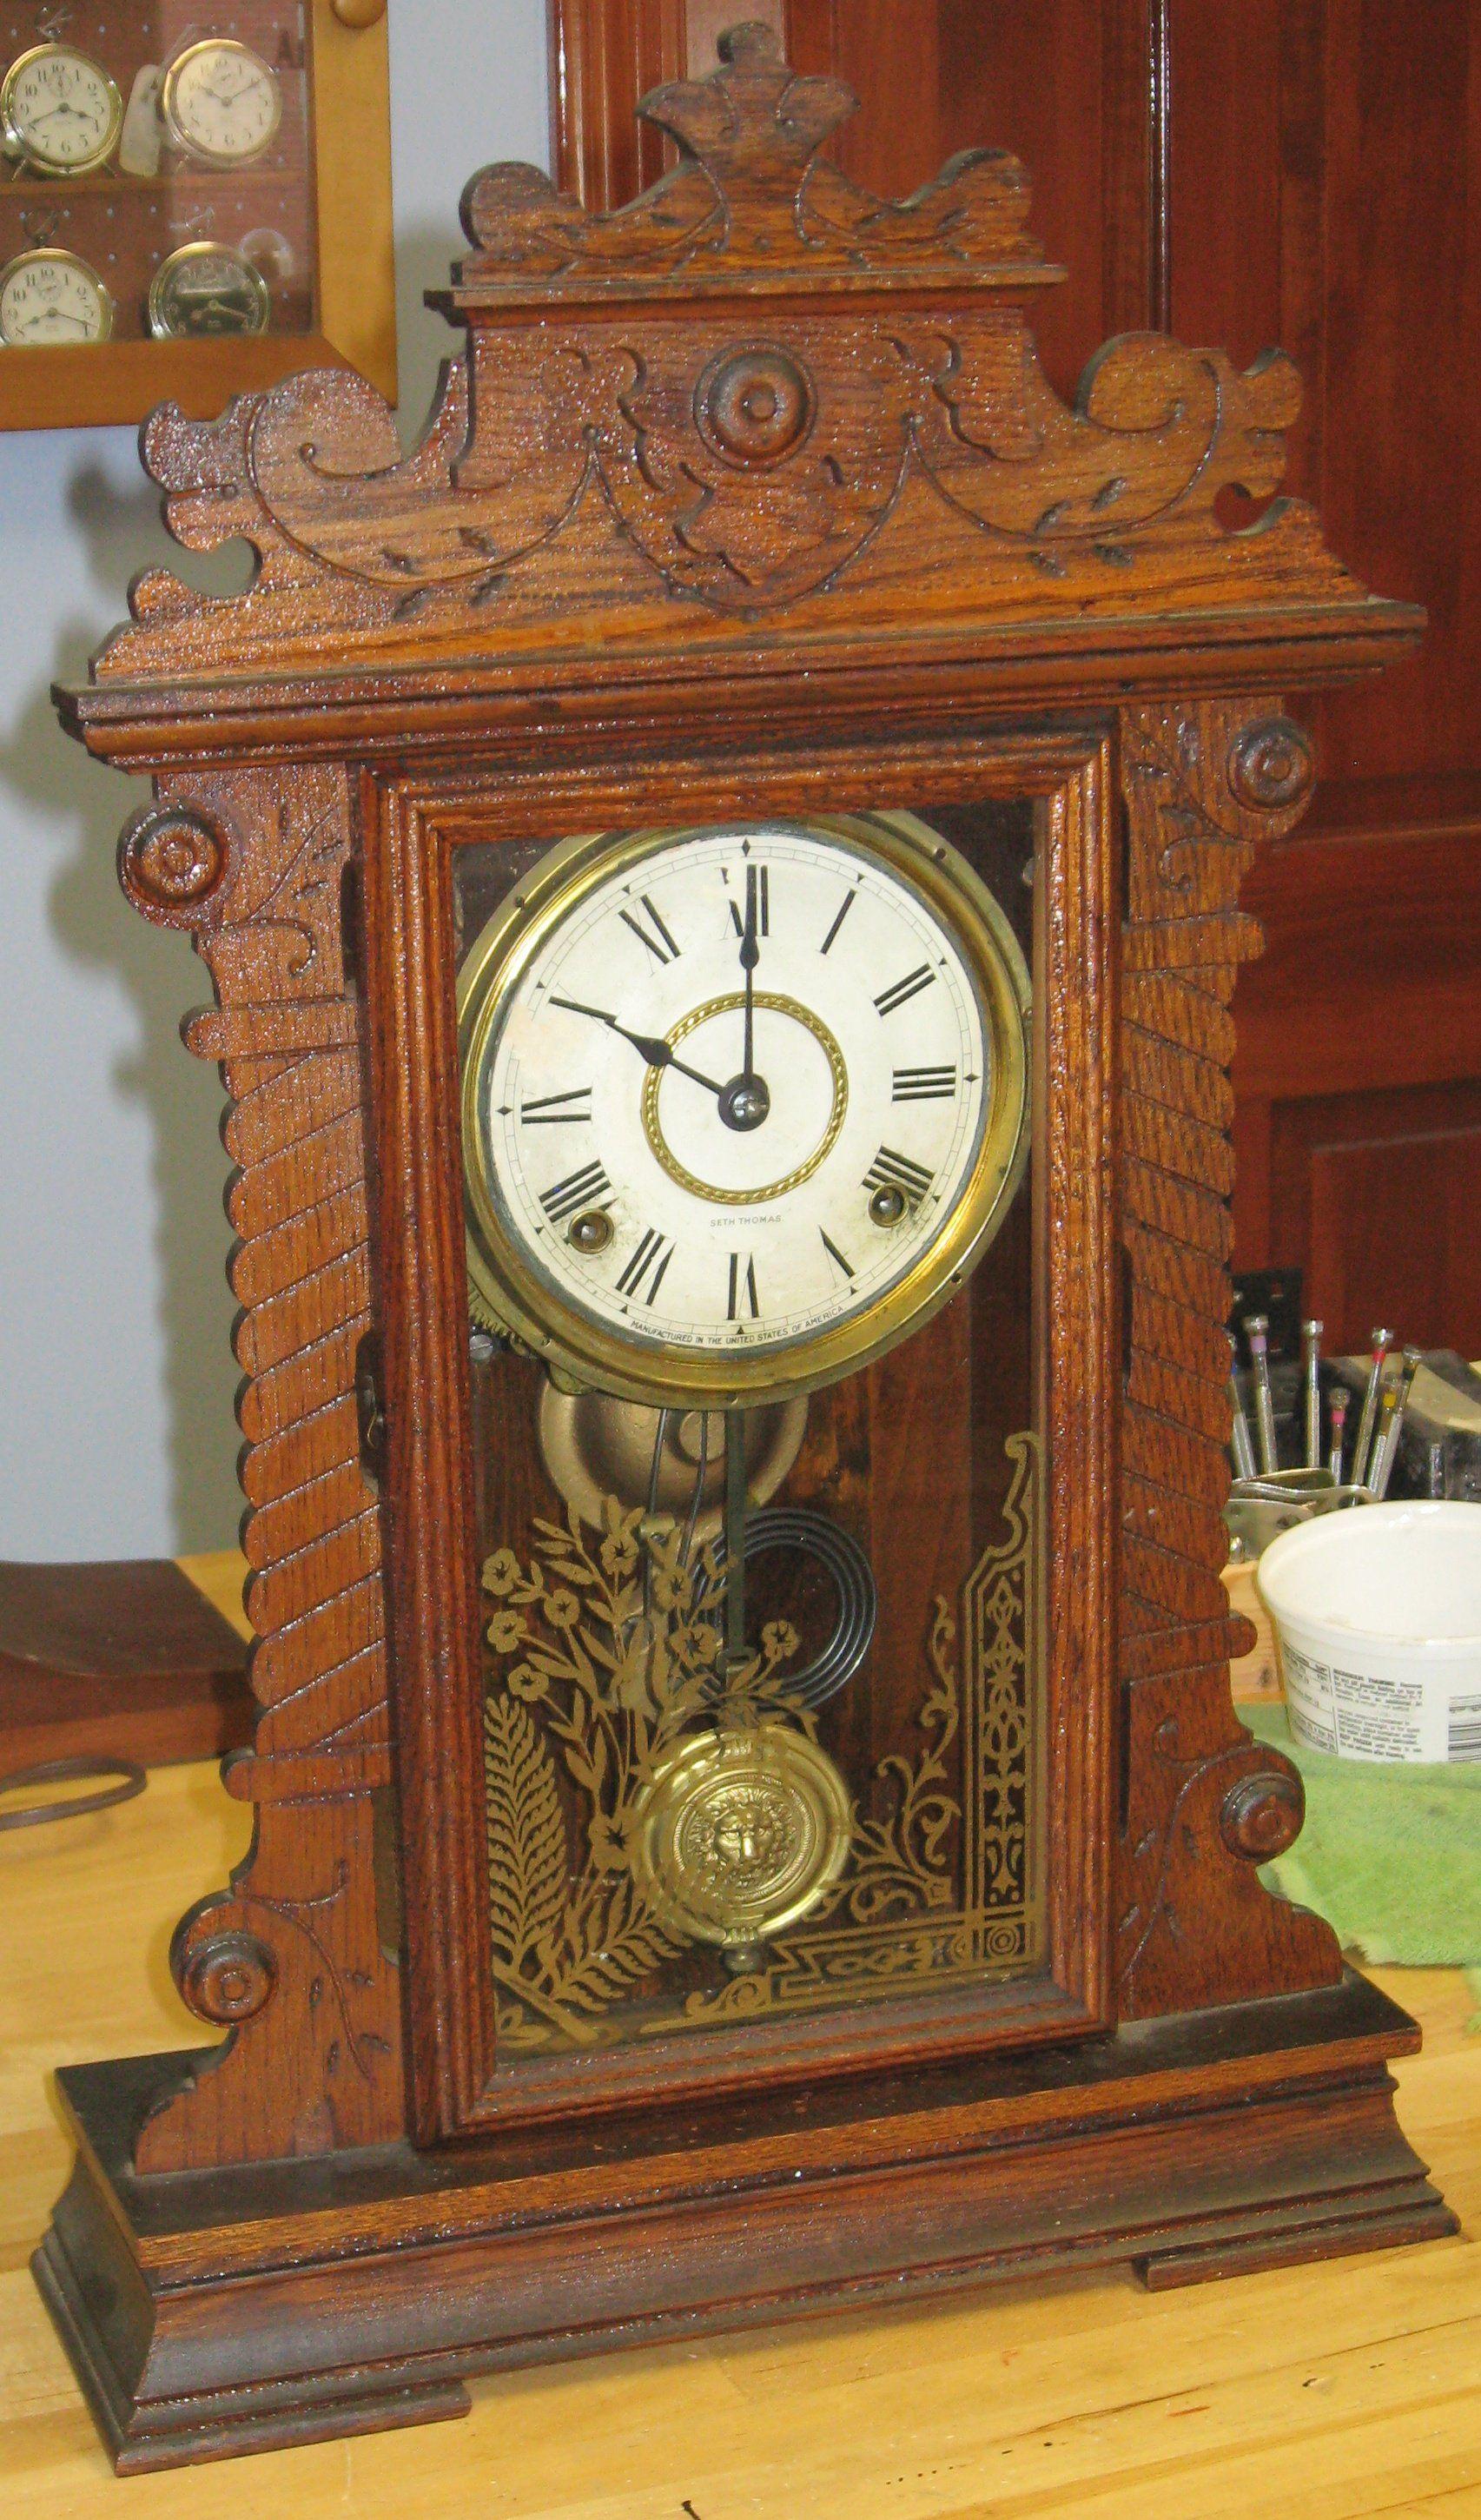 Dating Seth Thomas Clocks Antique Kitchen Clocks Vintage Clock